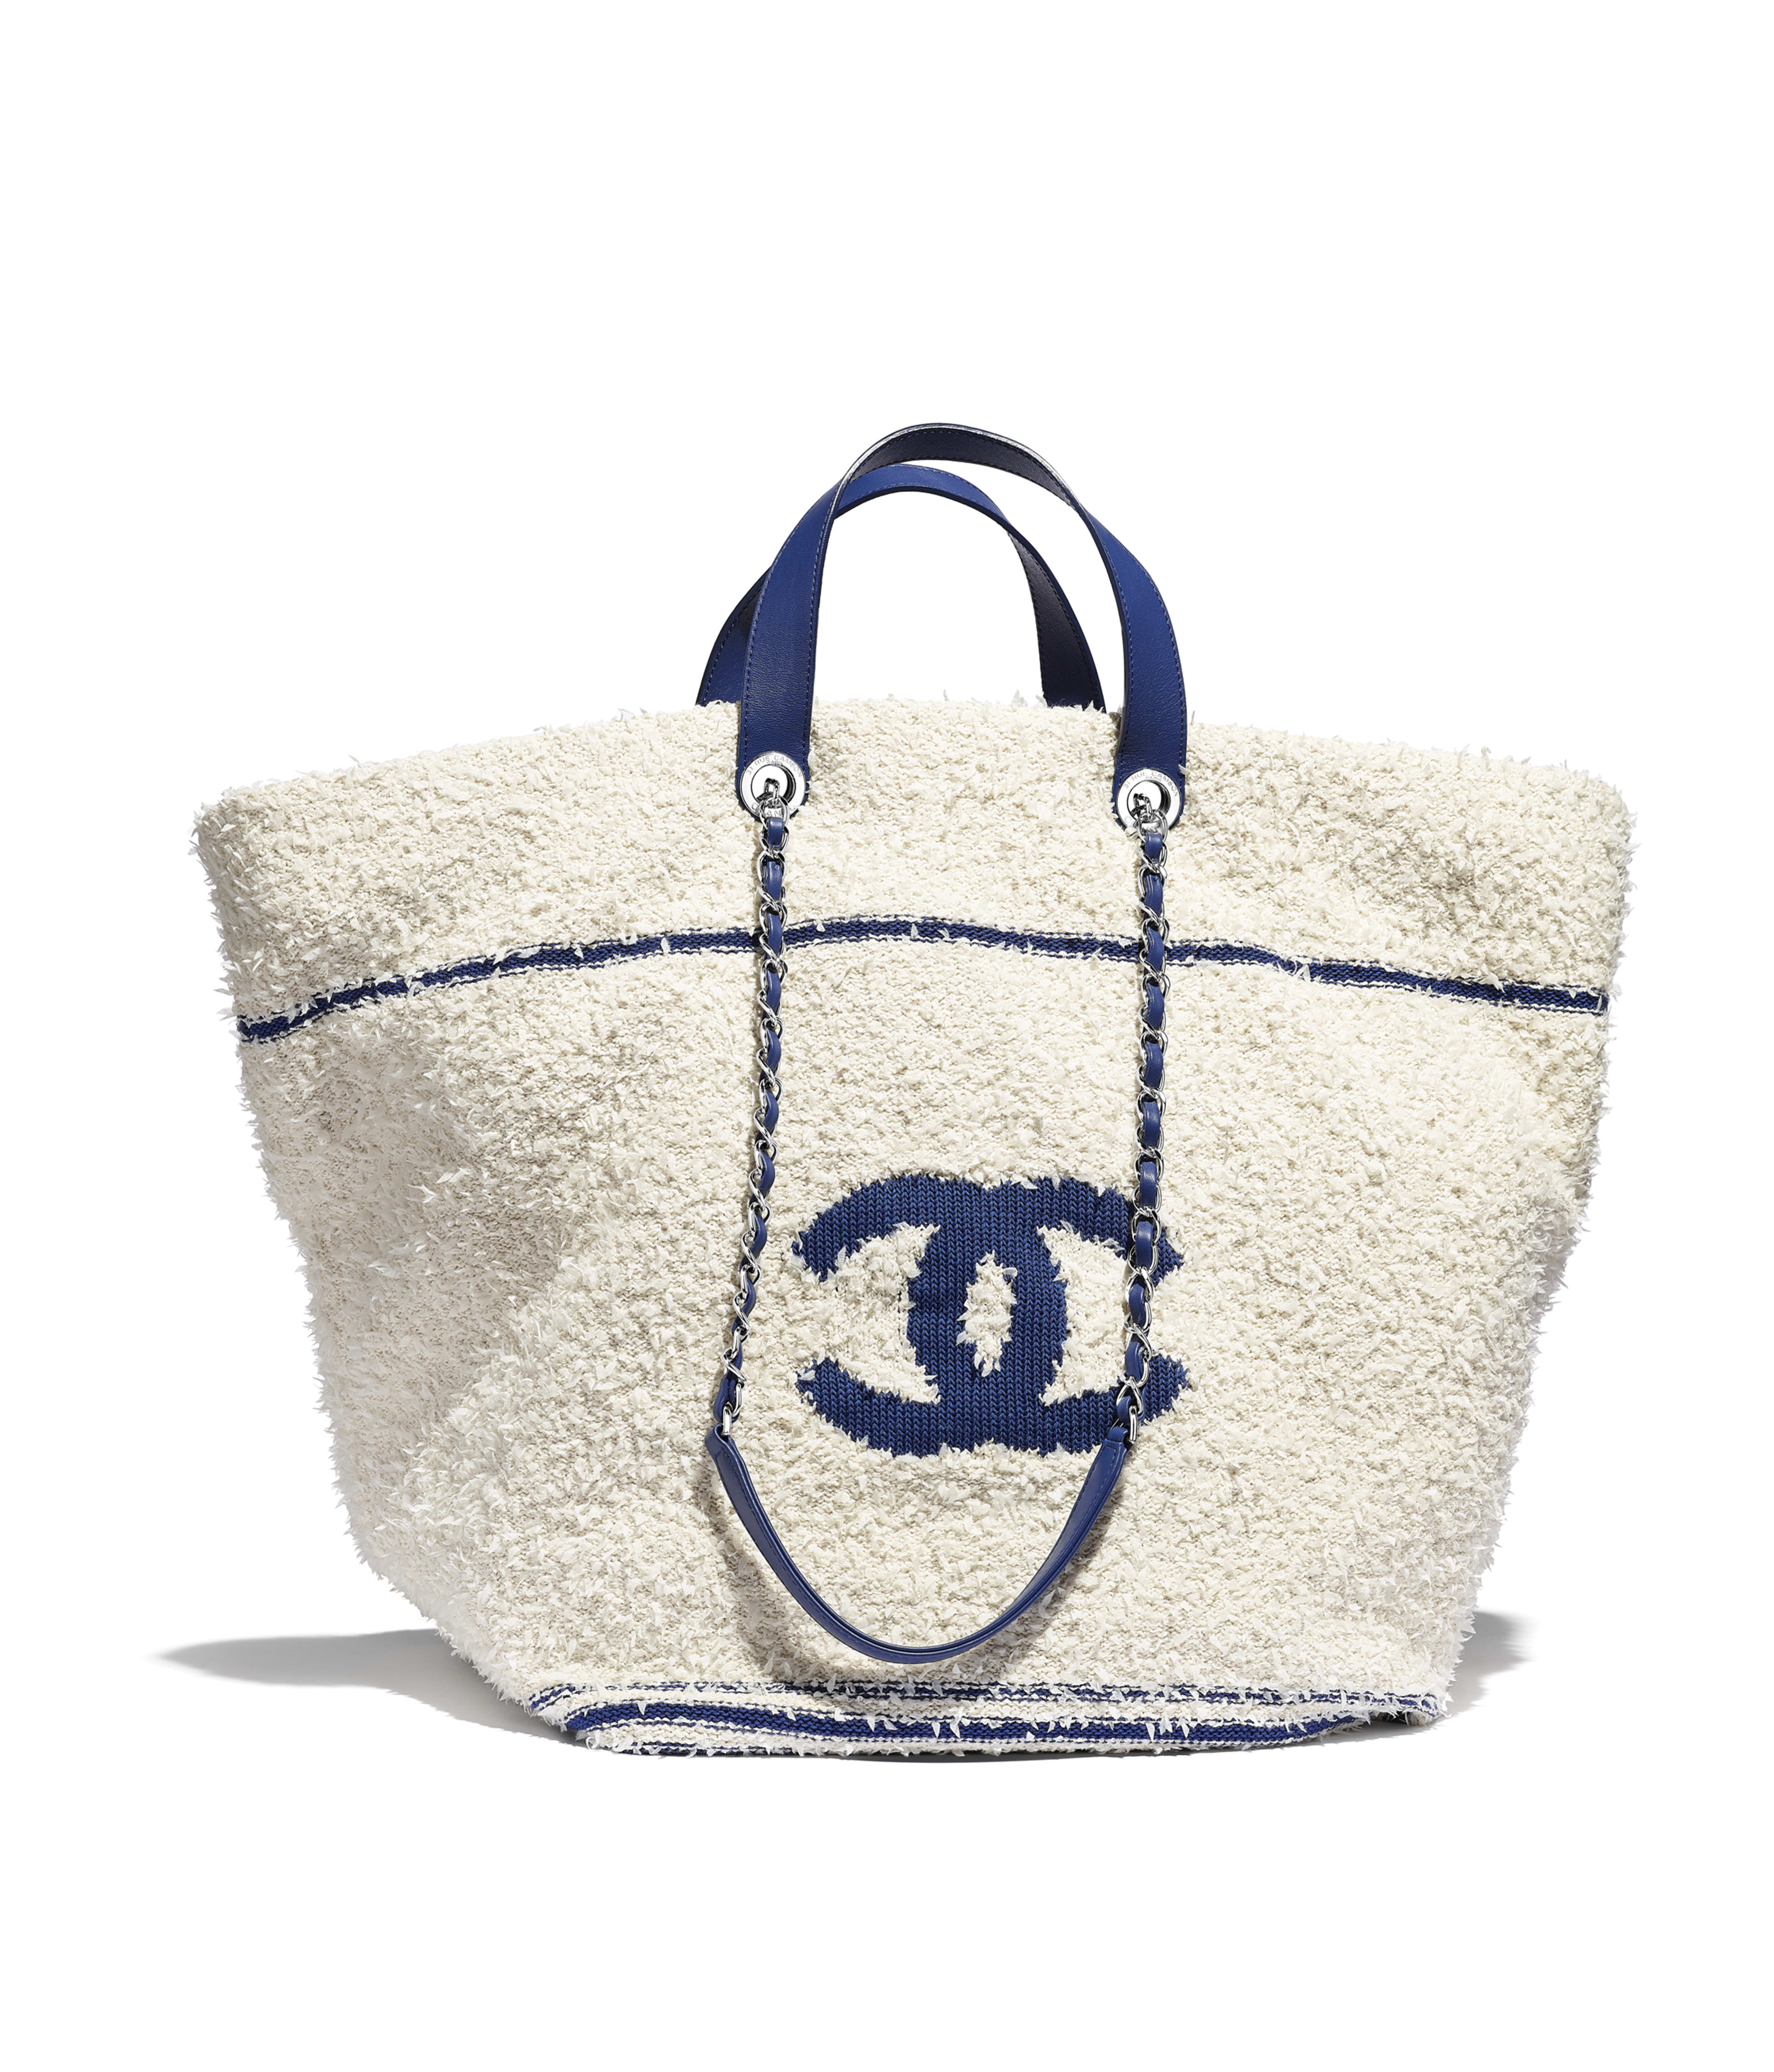 d791485718e5 Large Shopping Bag Cotton, Lambskin & Silver-Tone Metal, White & Blue Ref.  AS0452B00251N0360